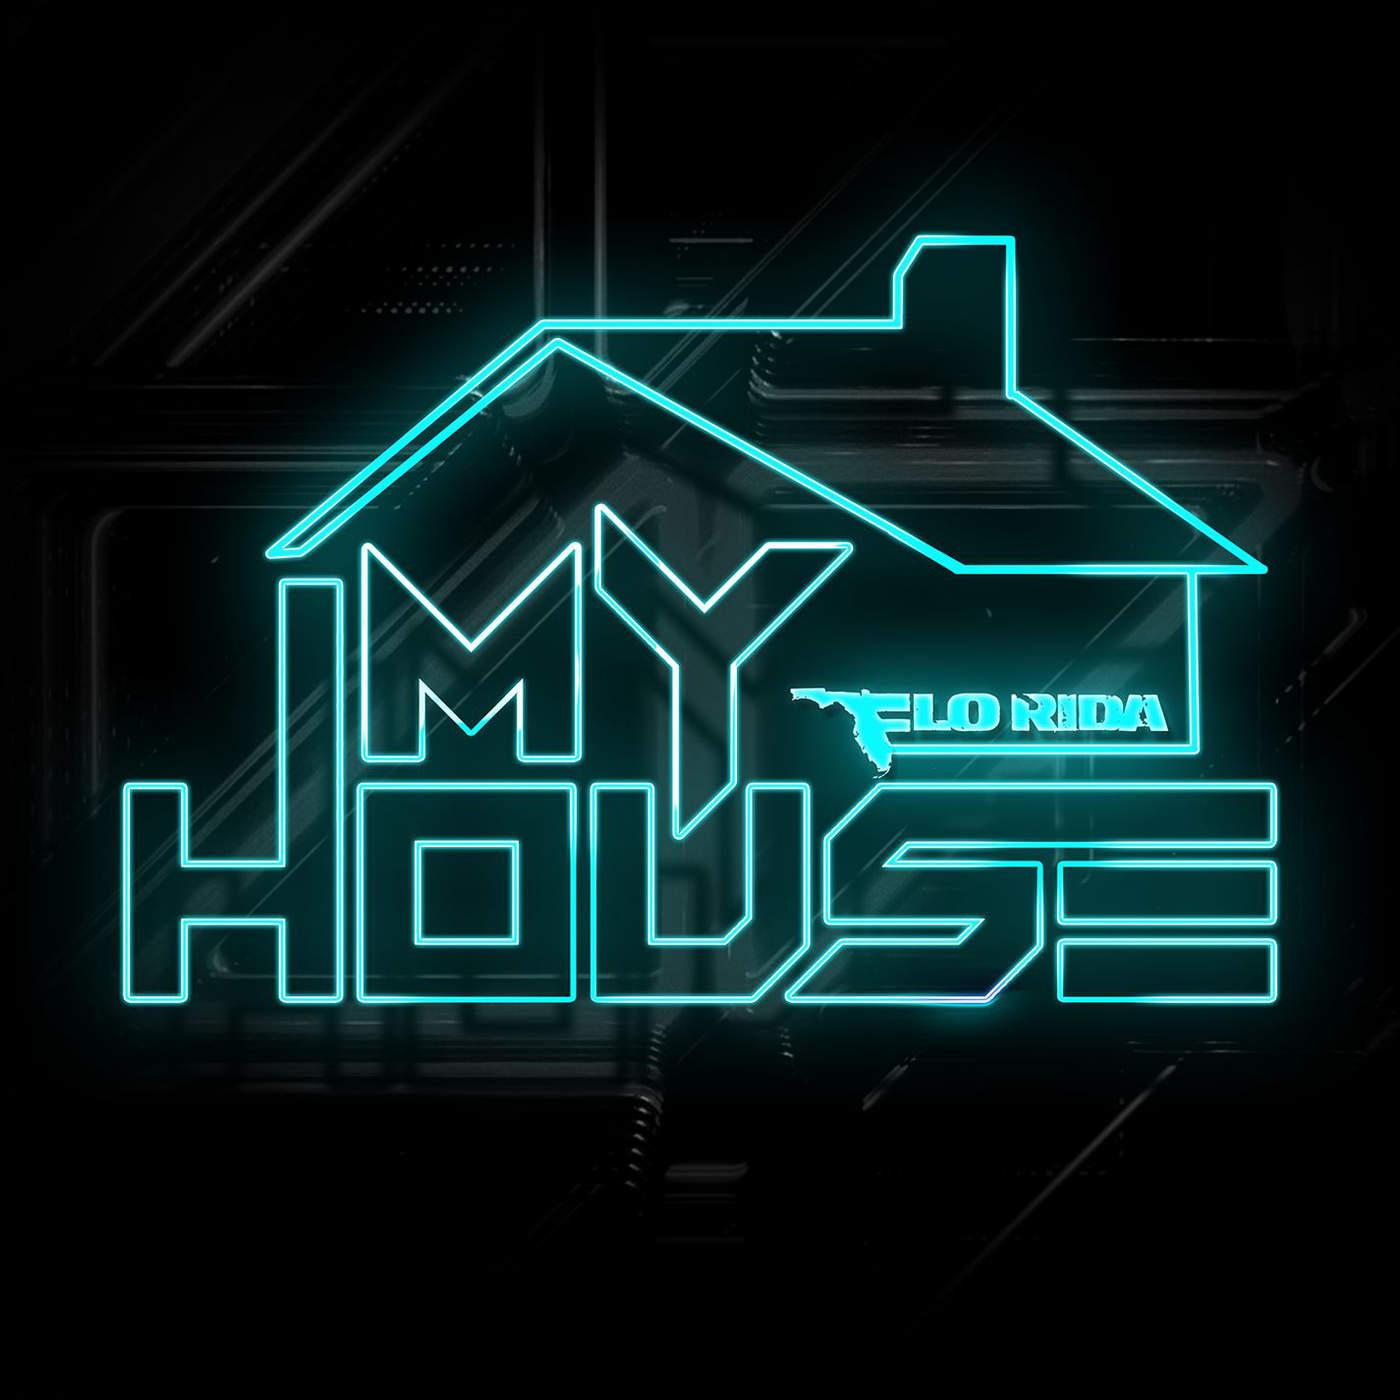 Flo Rida - My House - Single Cover